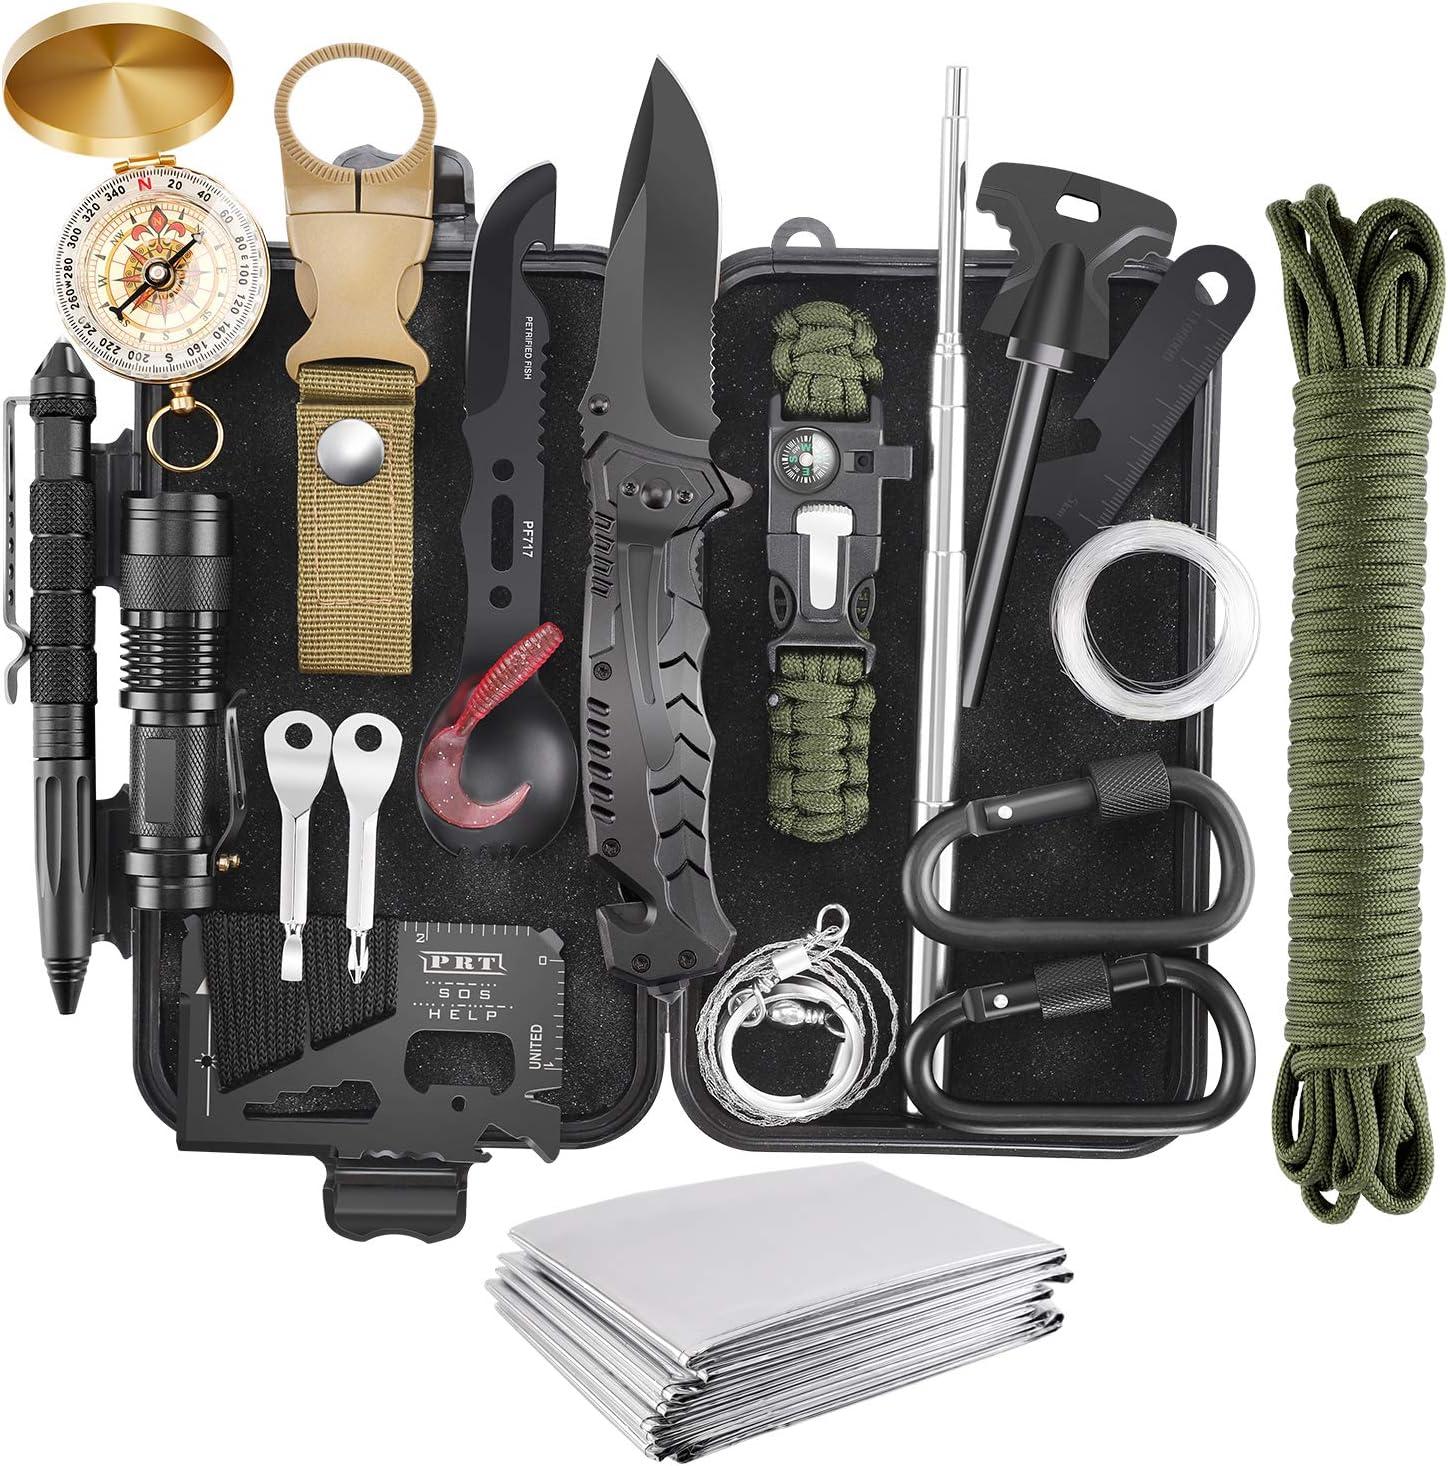 Verifygear 22 in 1  Emergency Survival Kit $21.44 Coupon